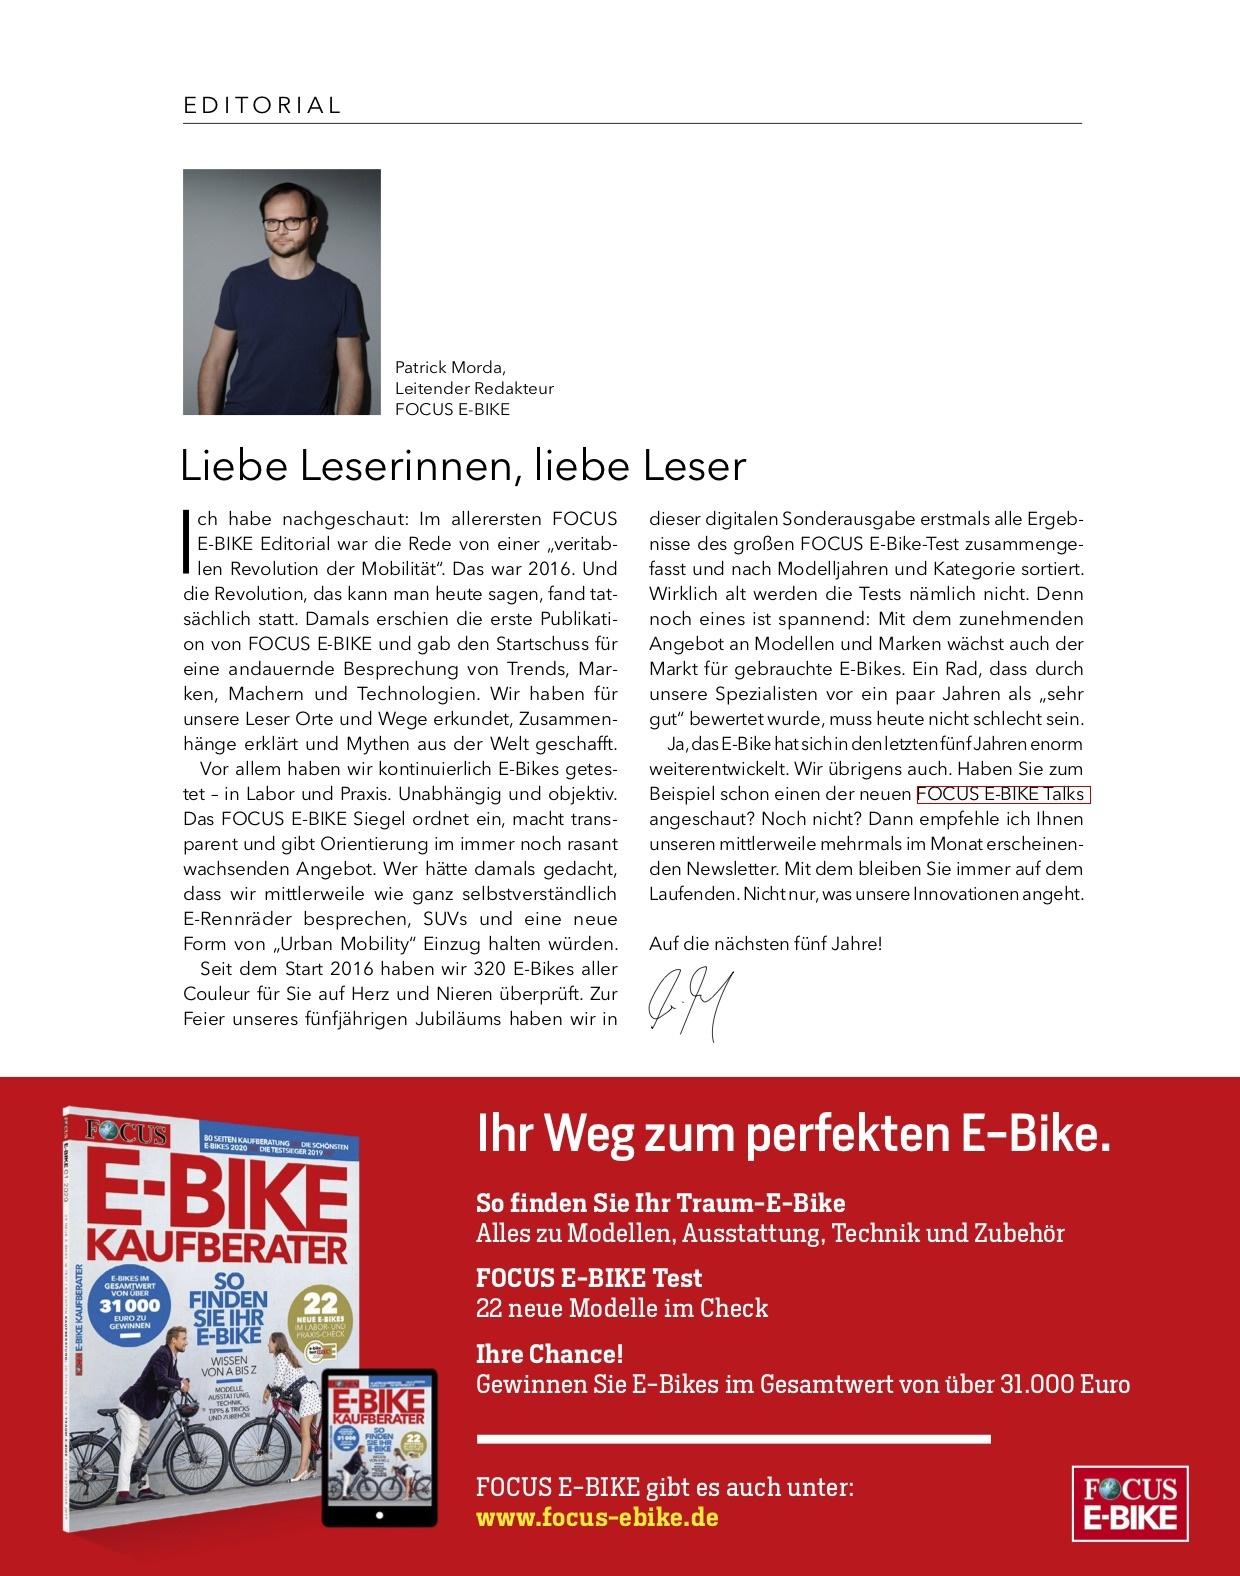 FOCUS E-BIKE FOCUS E-BIKE- 5 Jahre E-BIKE Tests